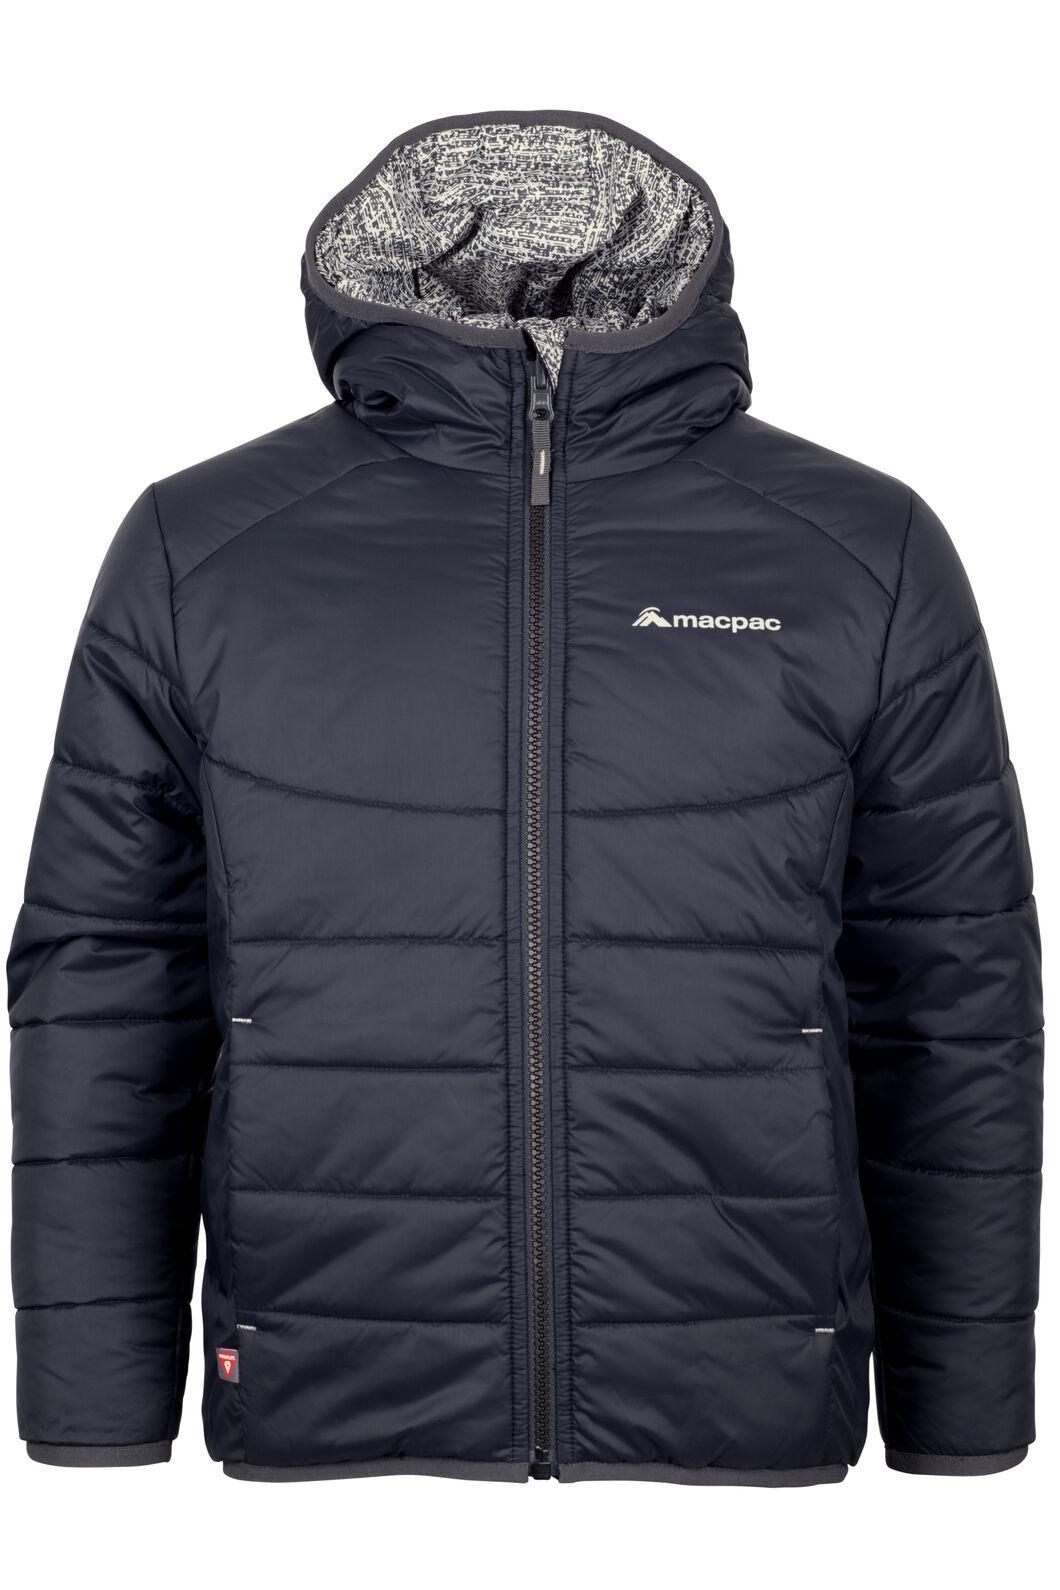 Macpac Pulsar Hooded Primaloft® SILVER Jacket - Kids', Black/Print, hi-res